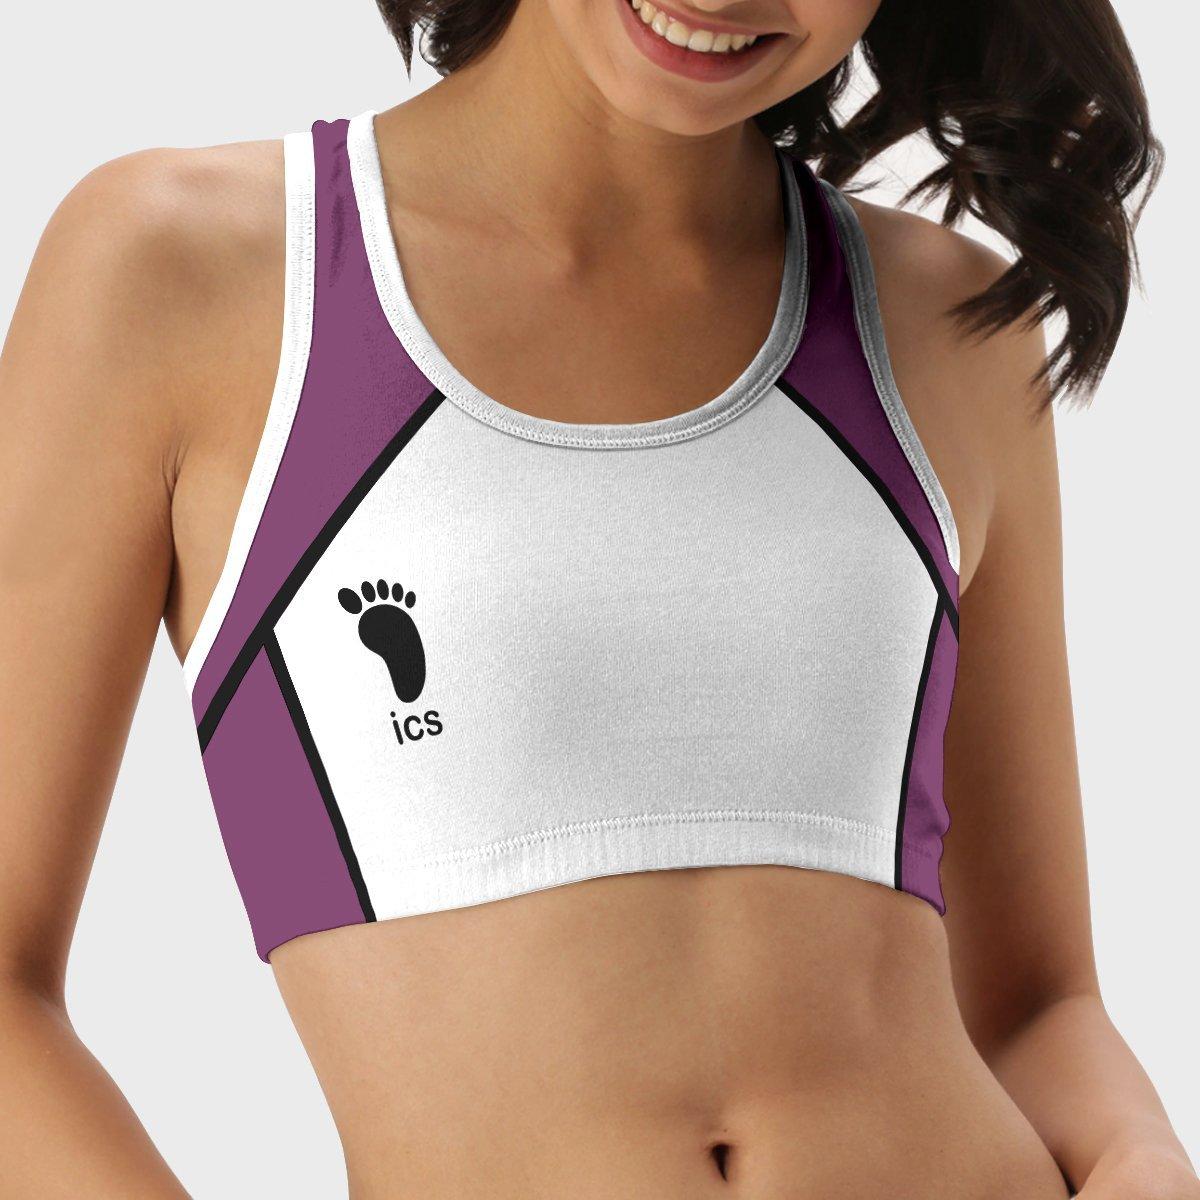 team shiratorizawa active wear set 974756 - Anime Swimsuits